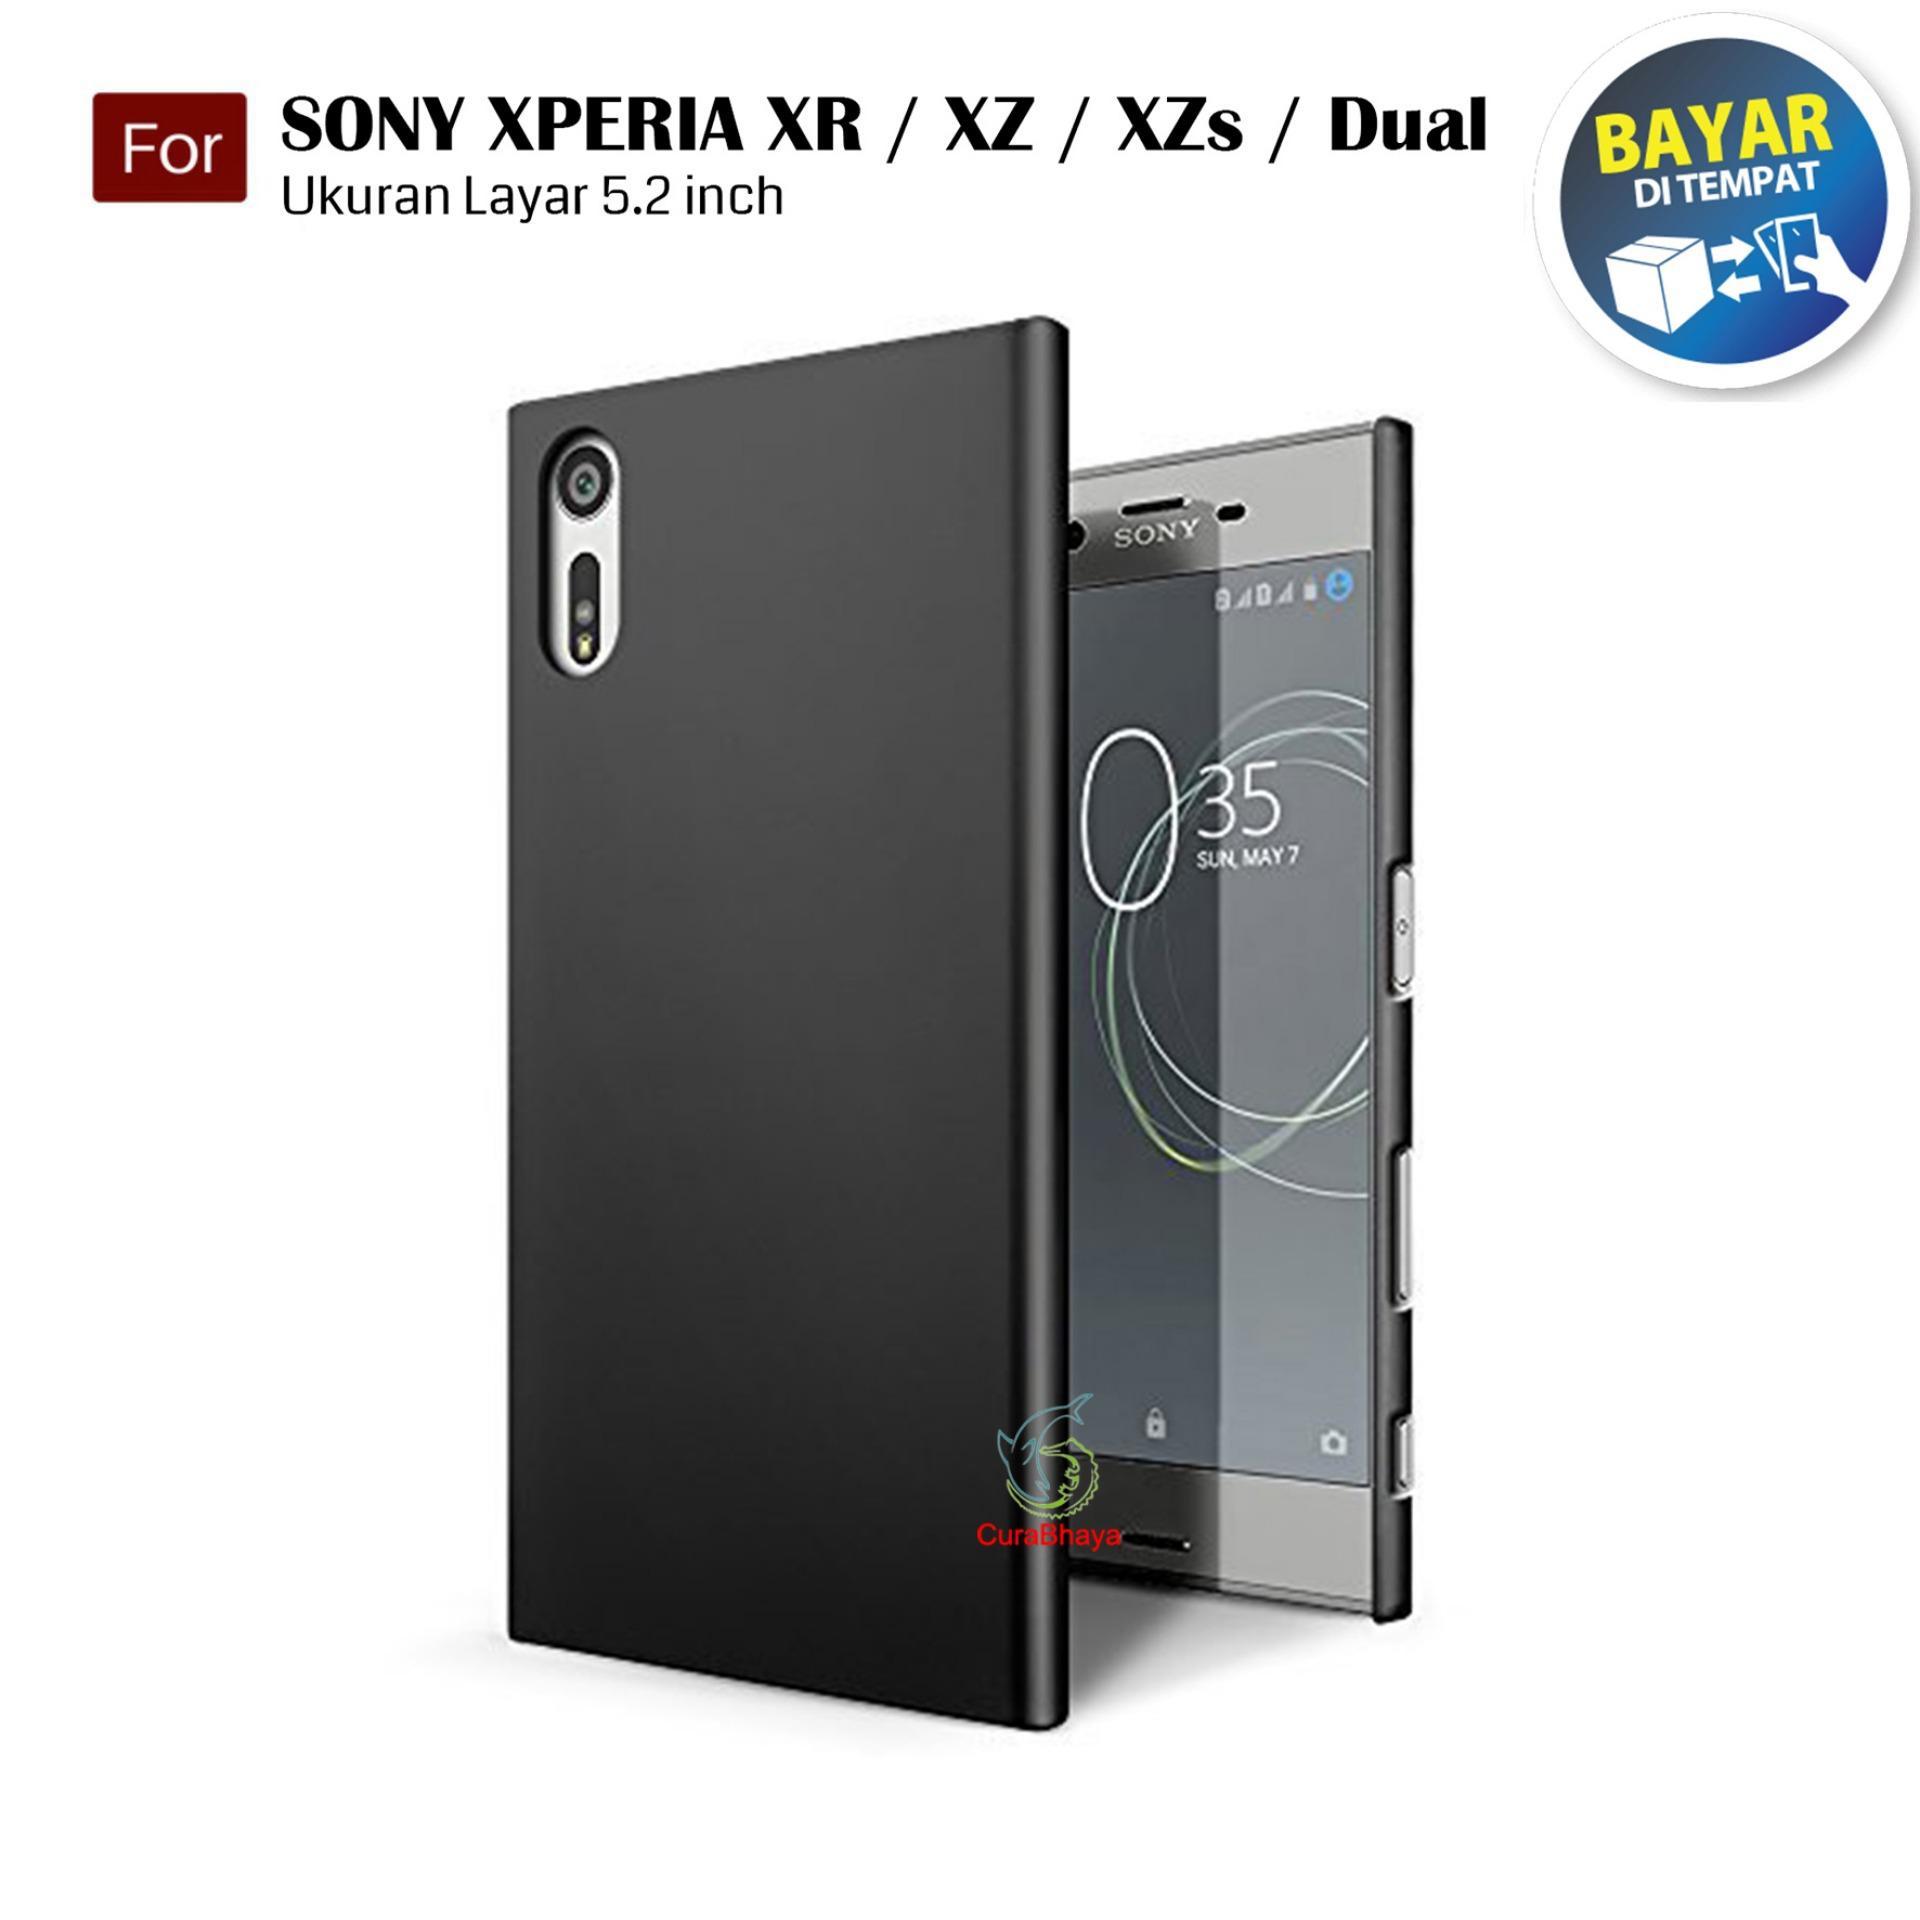 MidNight Sony Xperia Experia XZ / XZs / XR (5.2